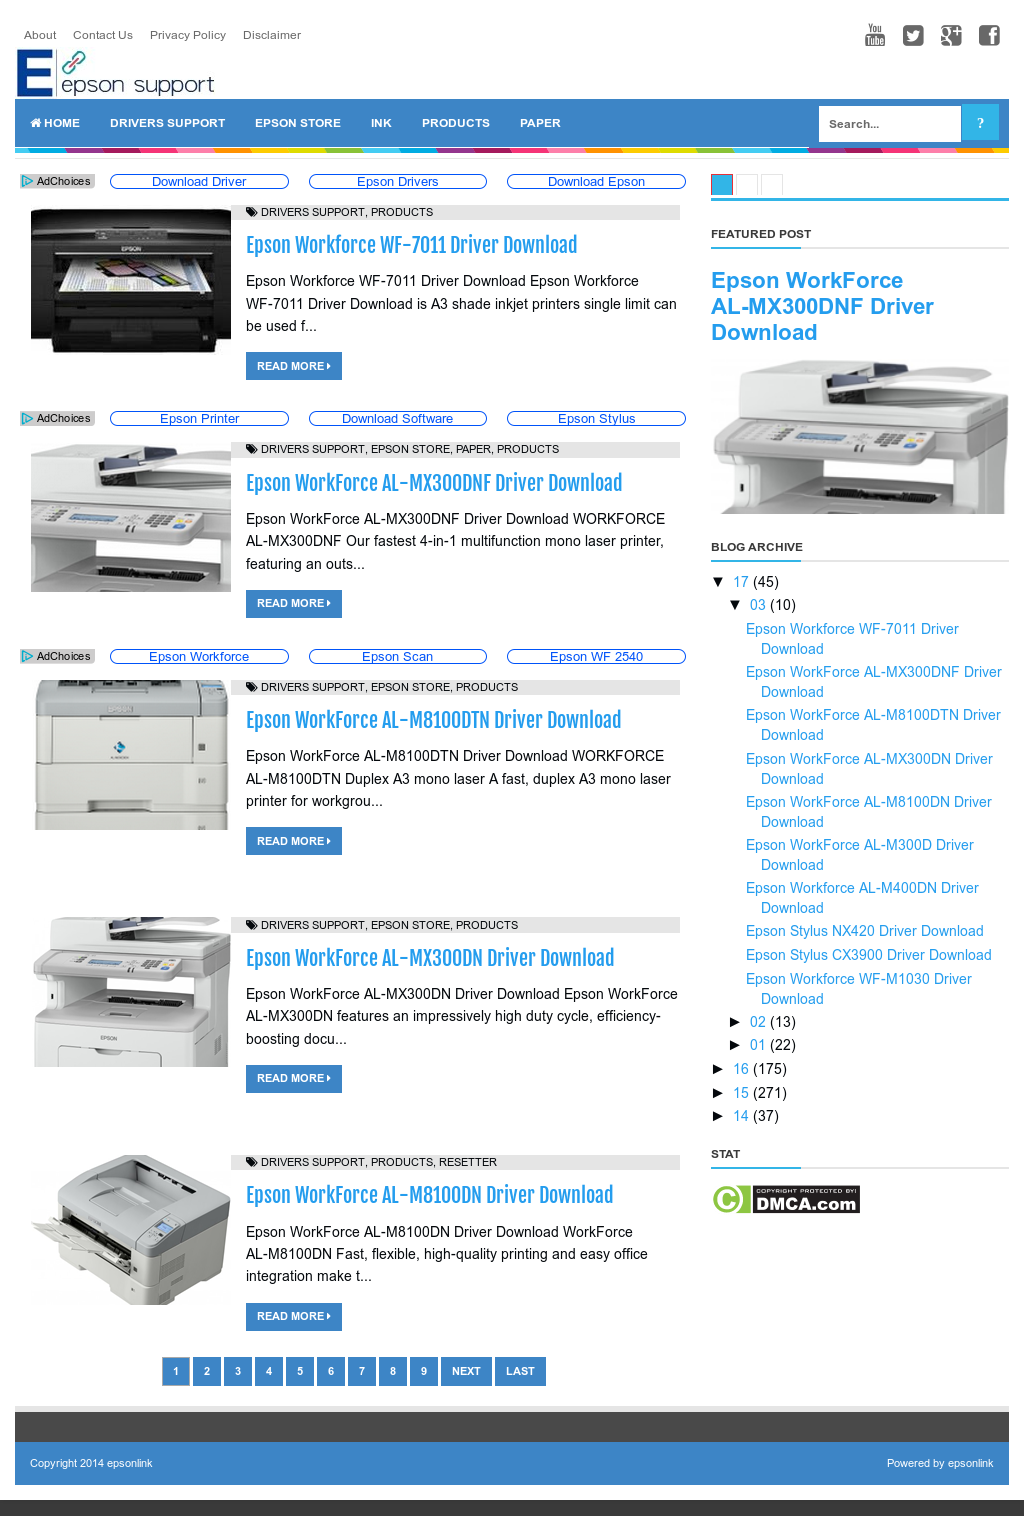 Owler Reports - Epsonlink Blog Epson ME-101 Resetter Free